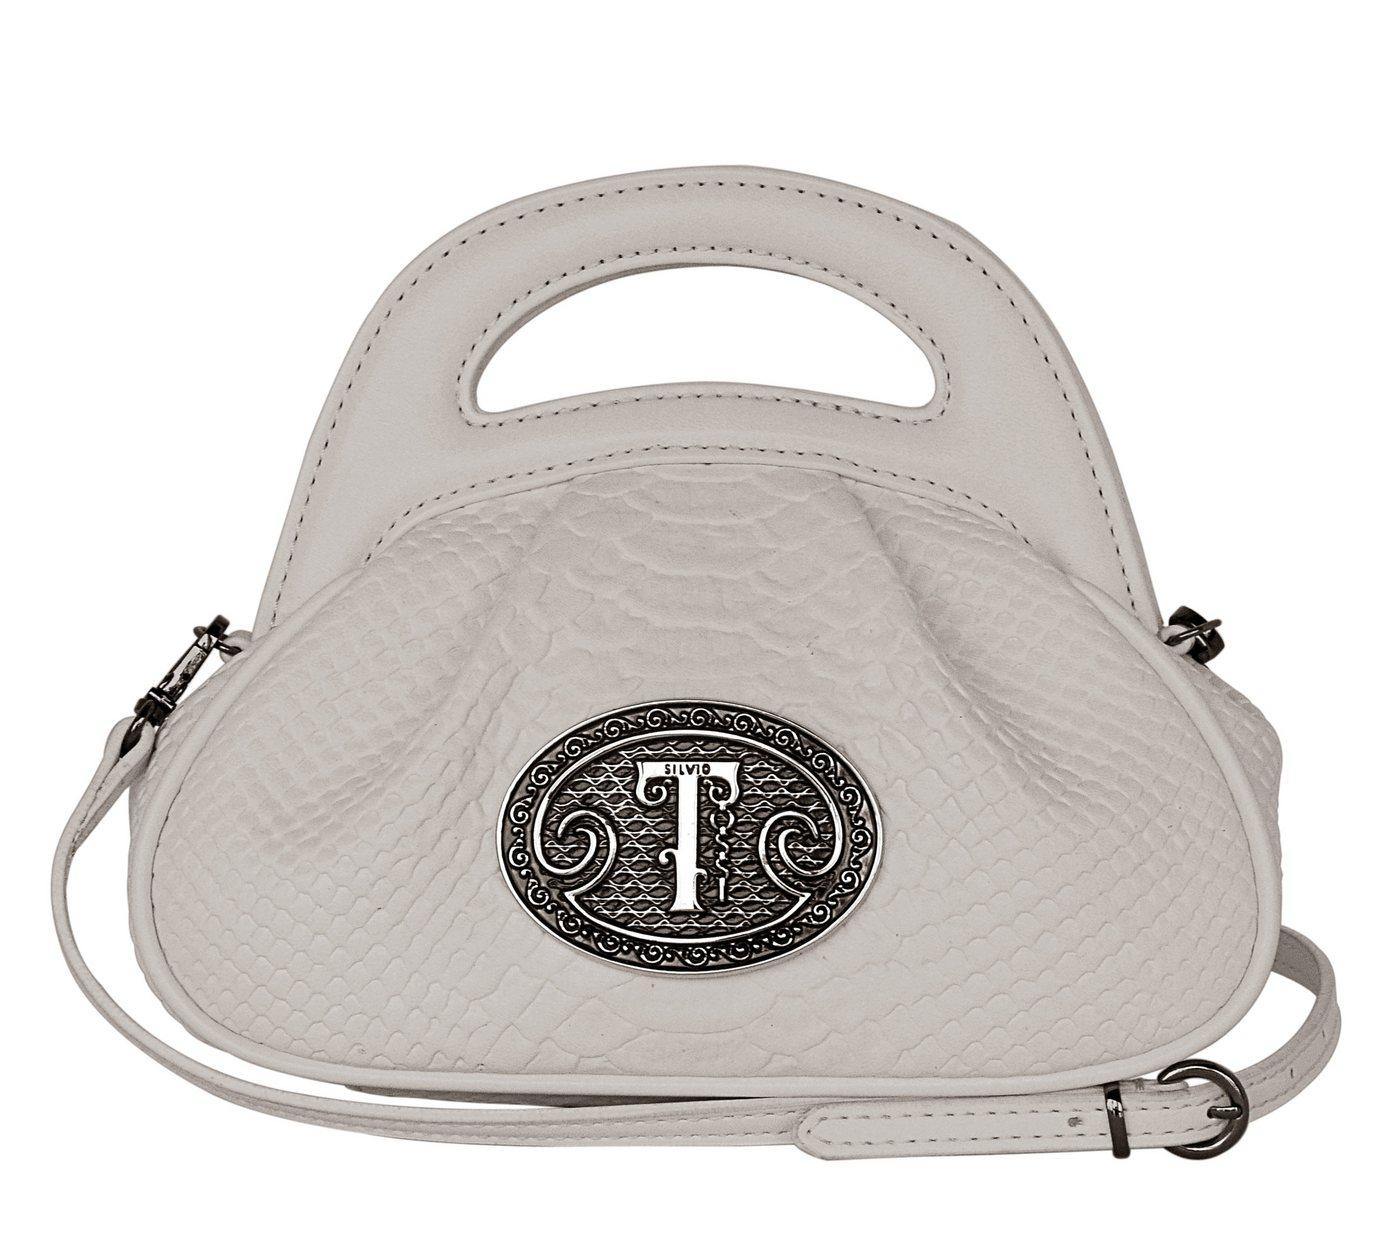 Silvio Tossi Lederhandtasche mit Anaconda-Prägung | Taschen > Handtaschen > Ledertaschen | Weiß | Baumwolle | Silvio Tossi